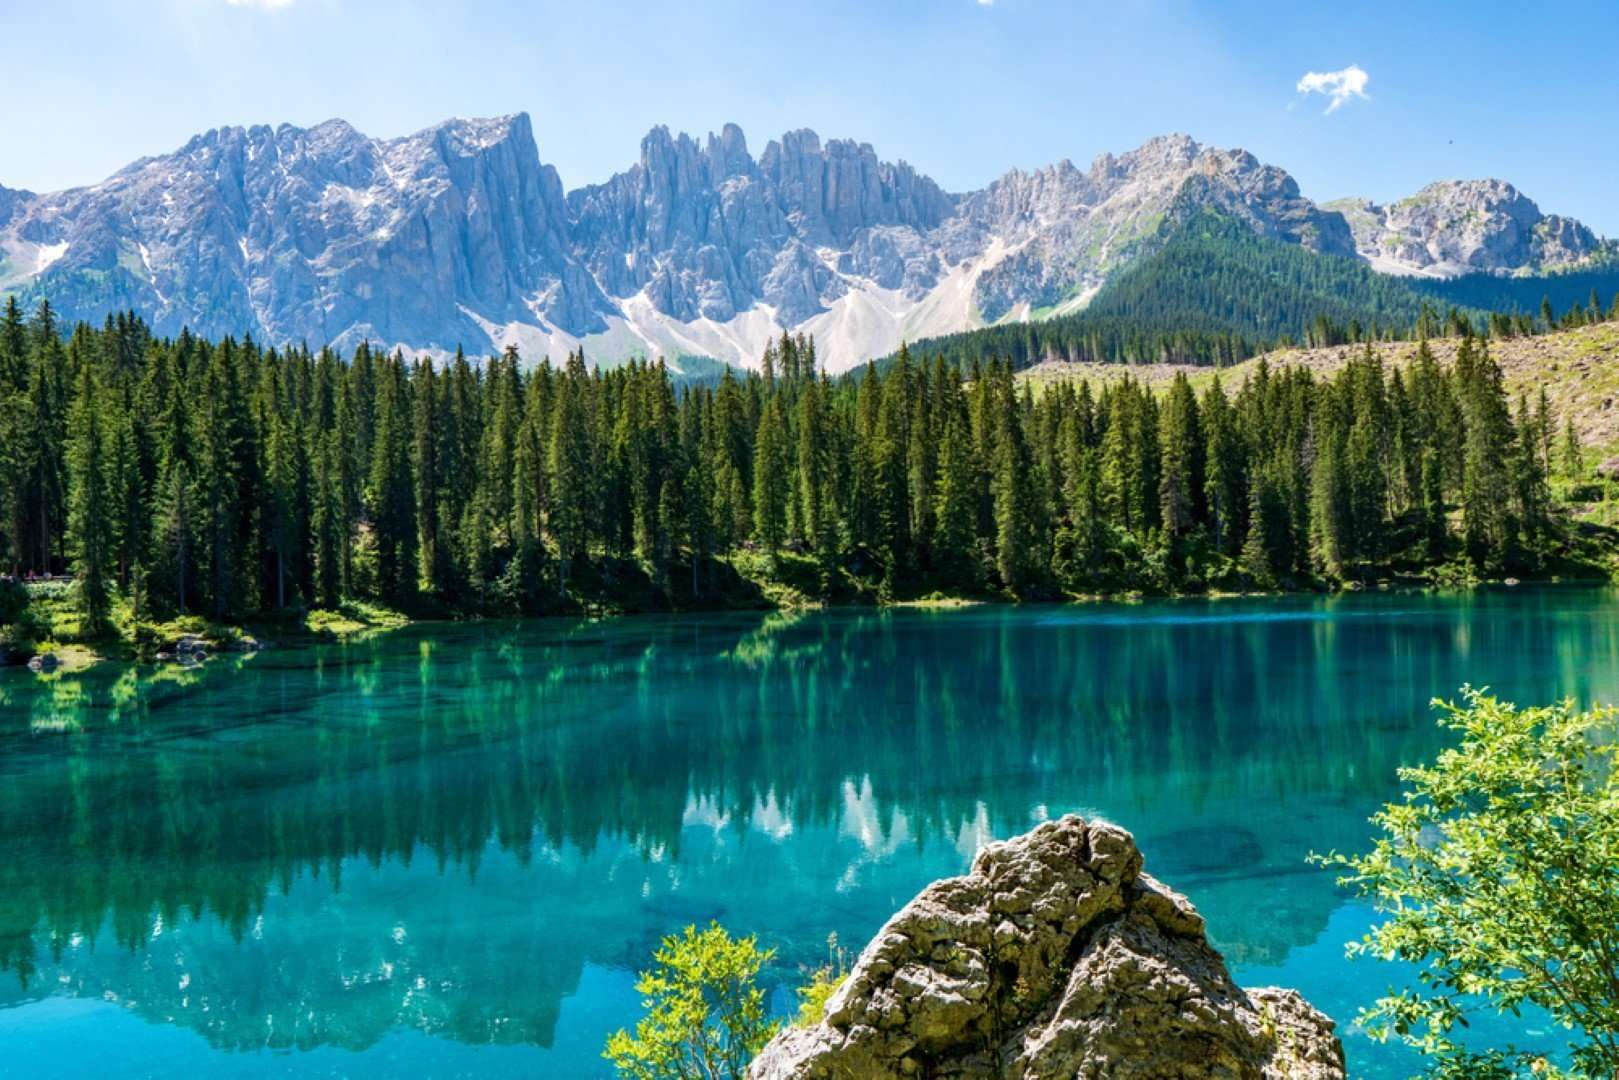 lago di carezza - noord italie